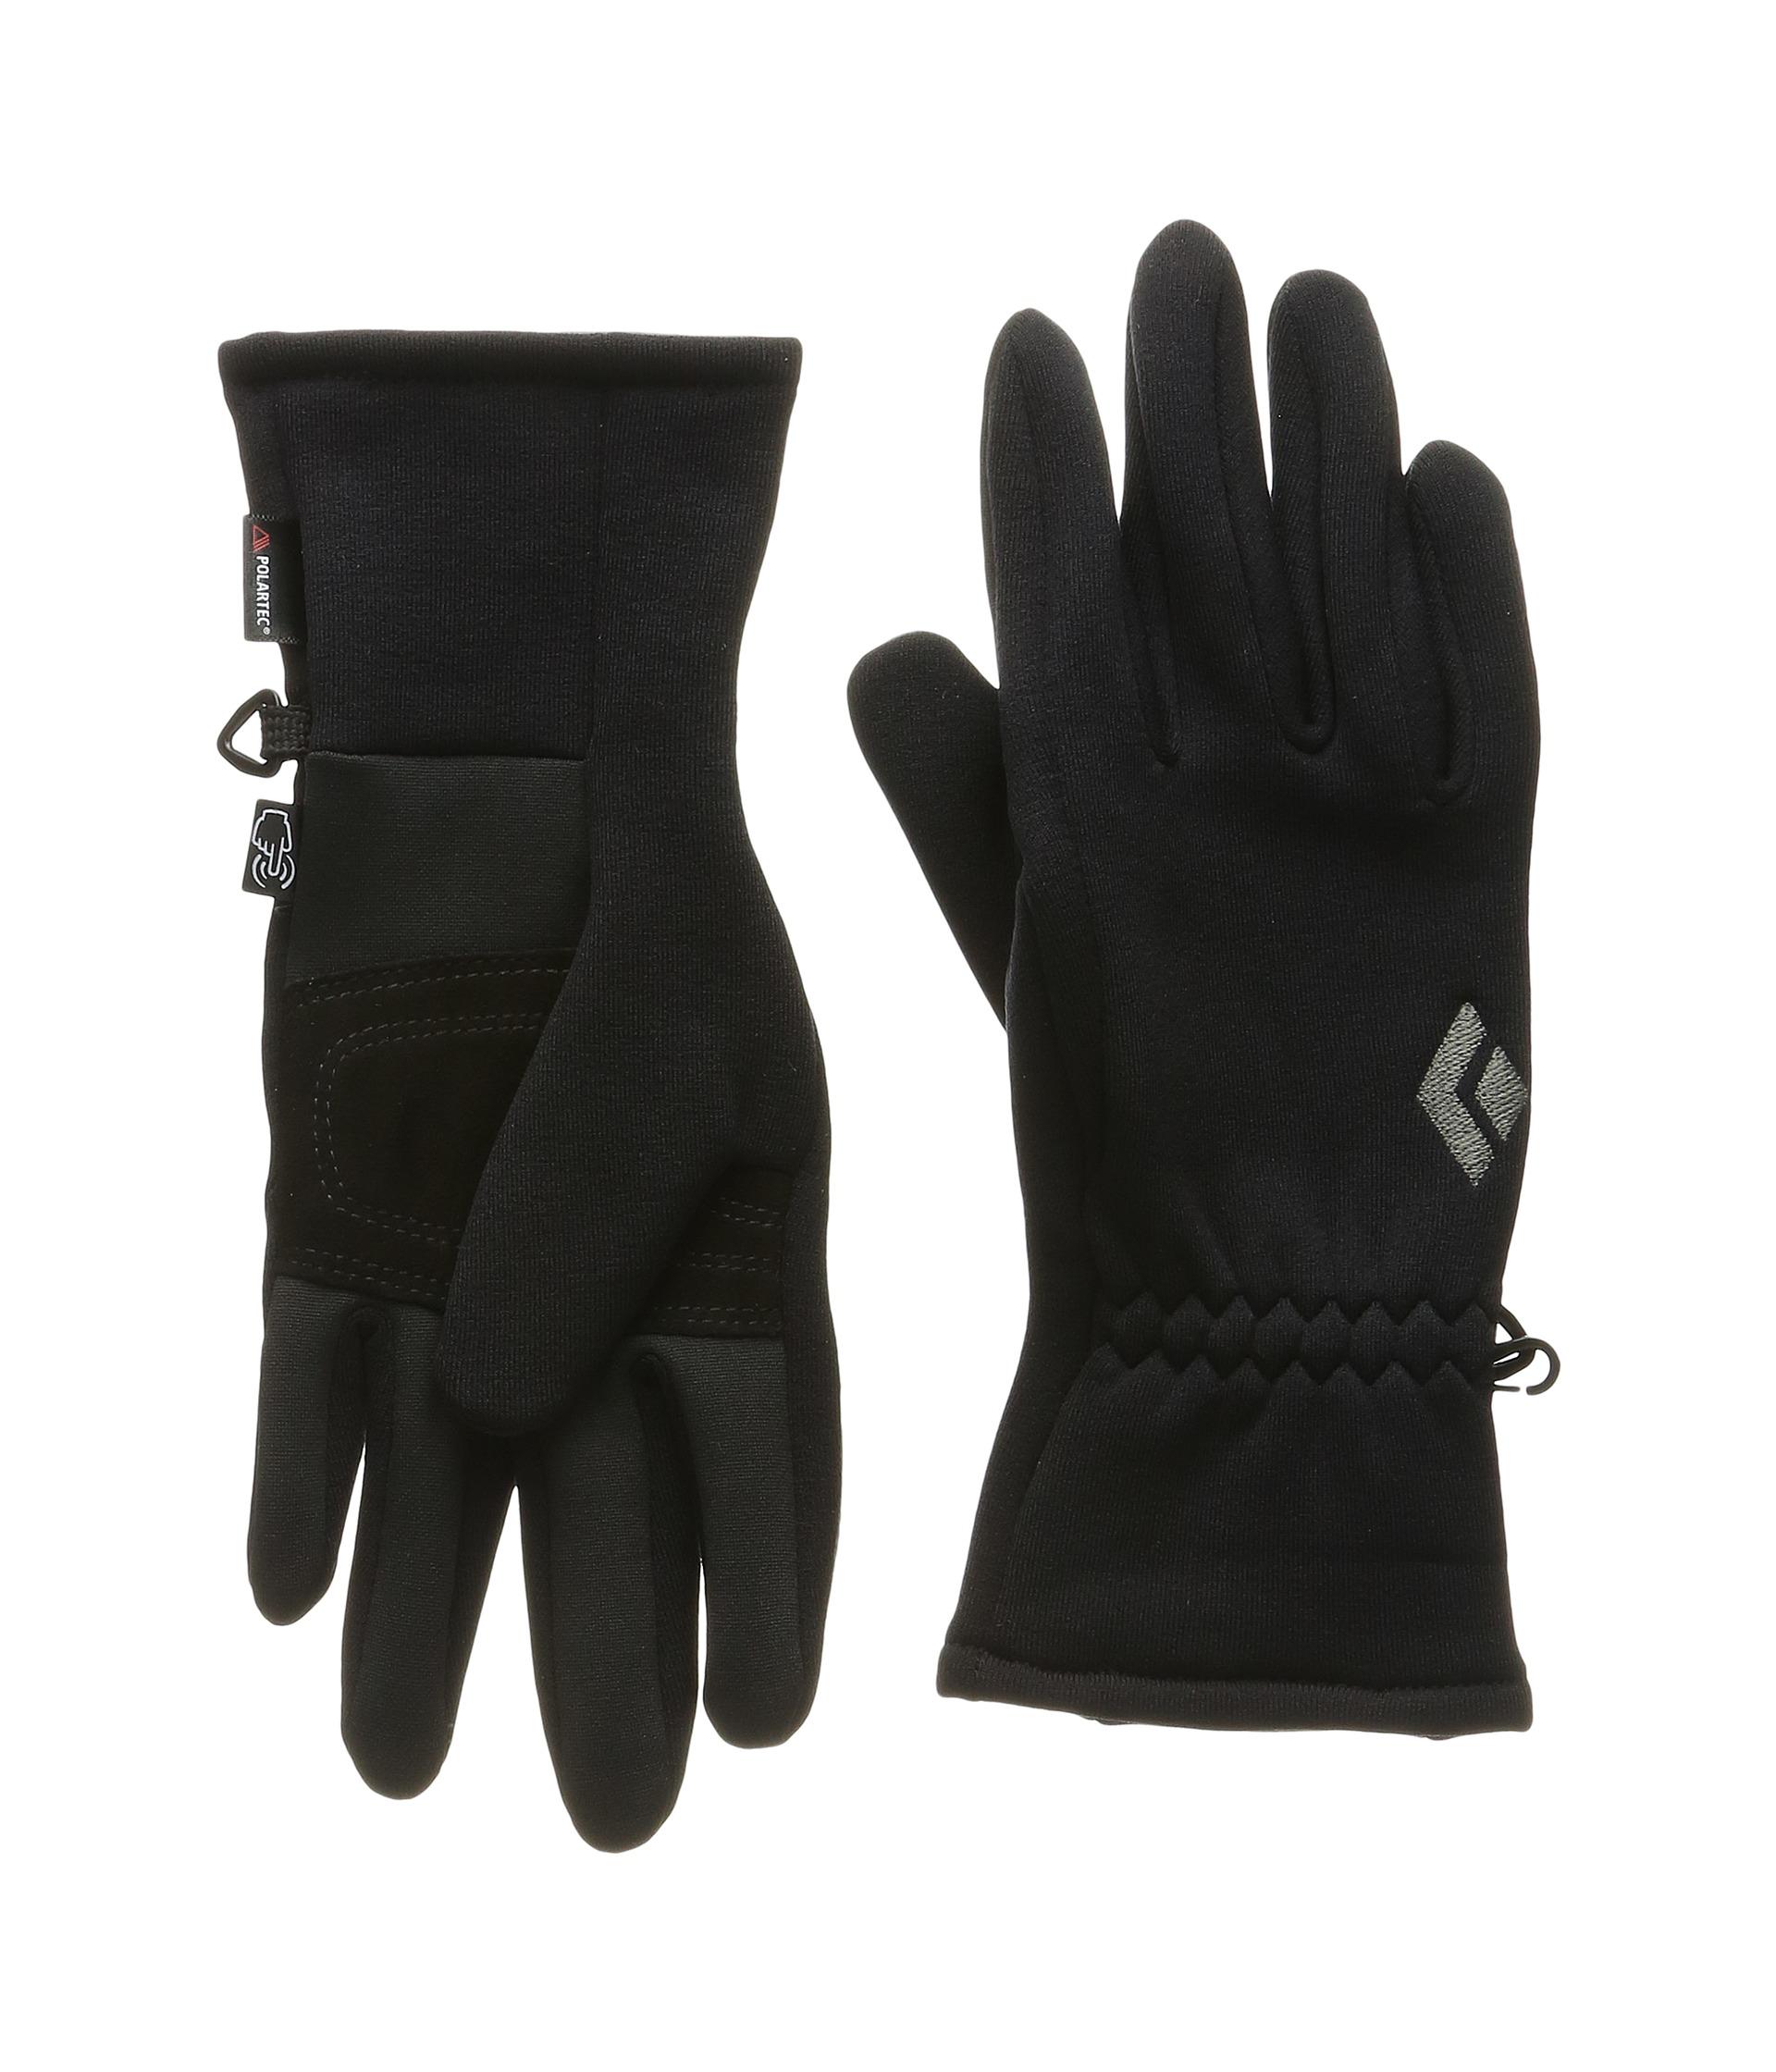 Womens leather ski gloves - Black Diamond Midweight Screentap Gloves